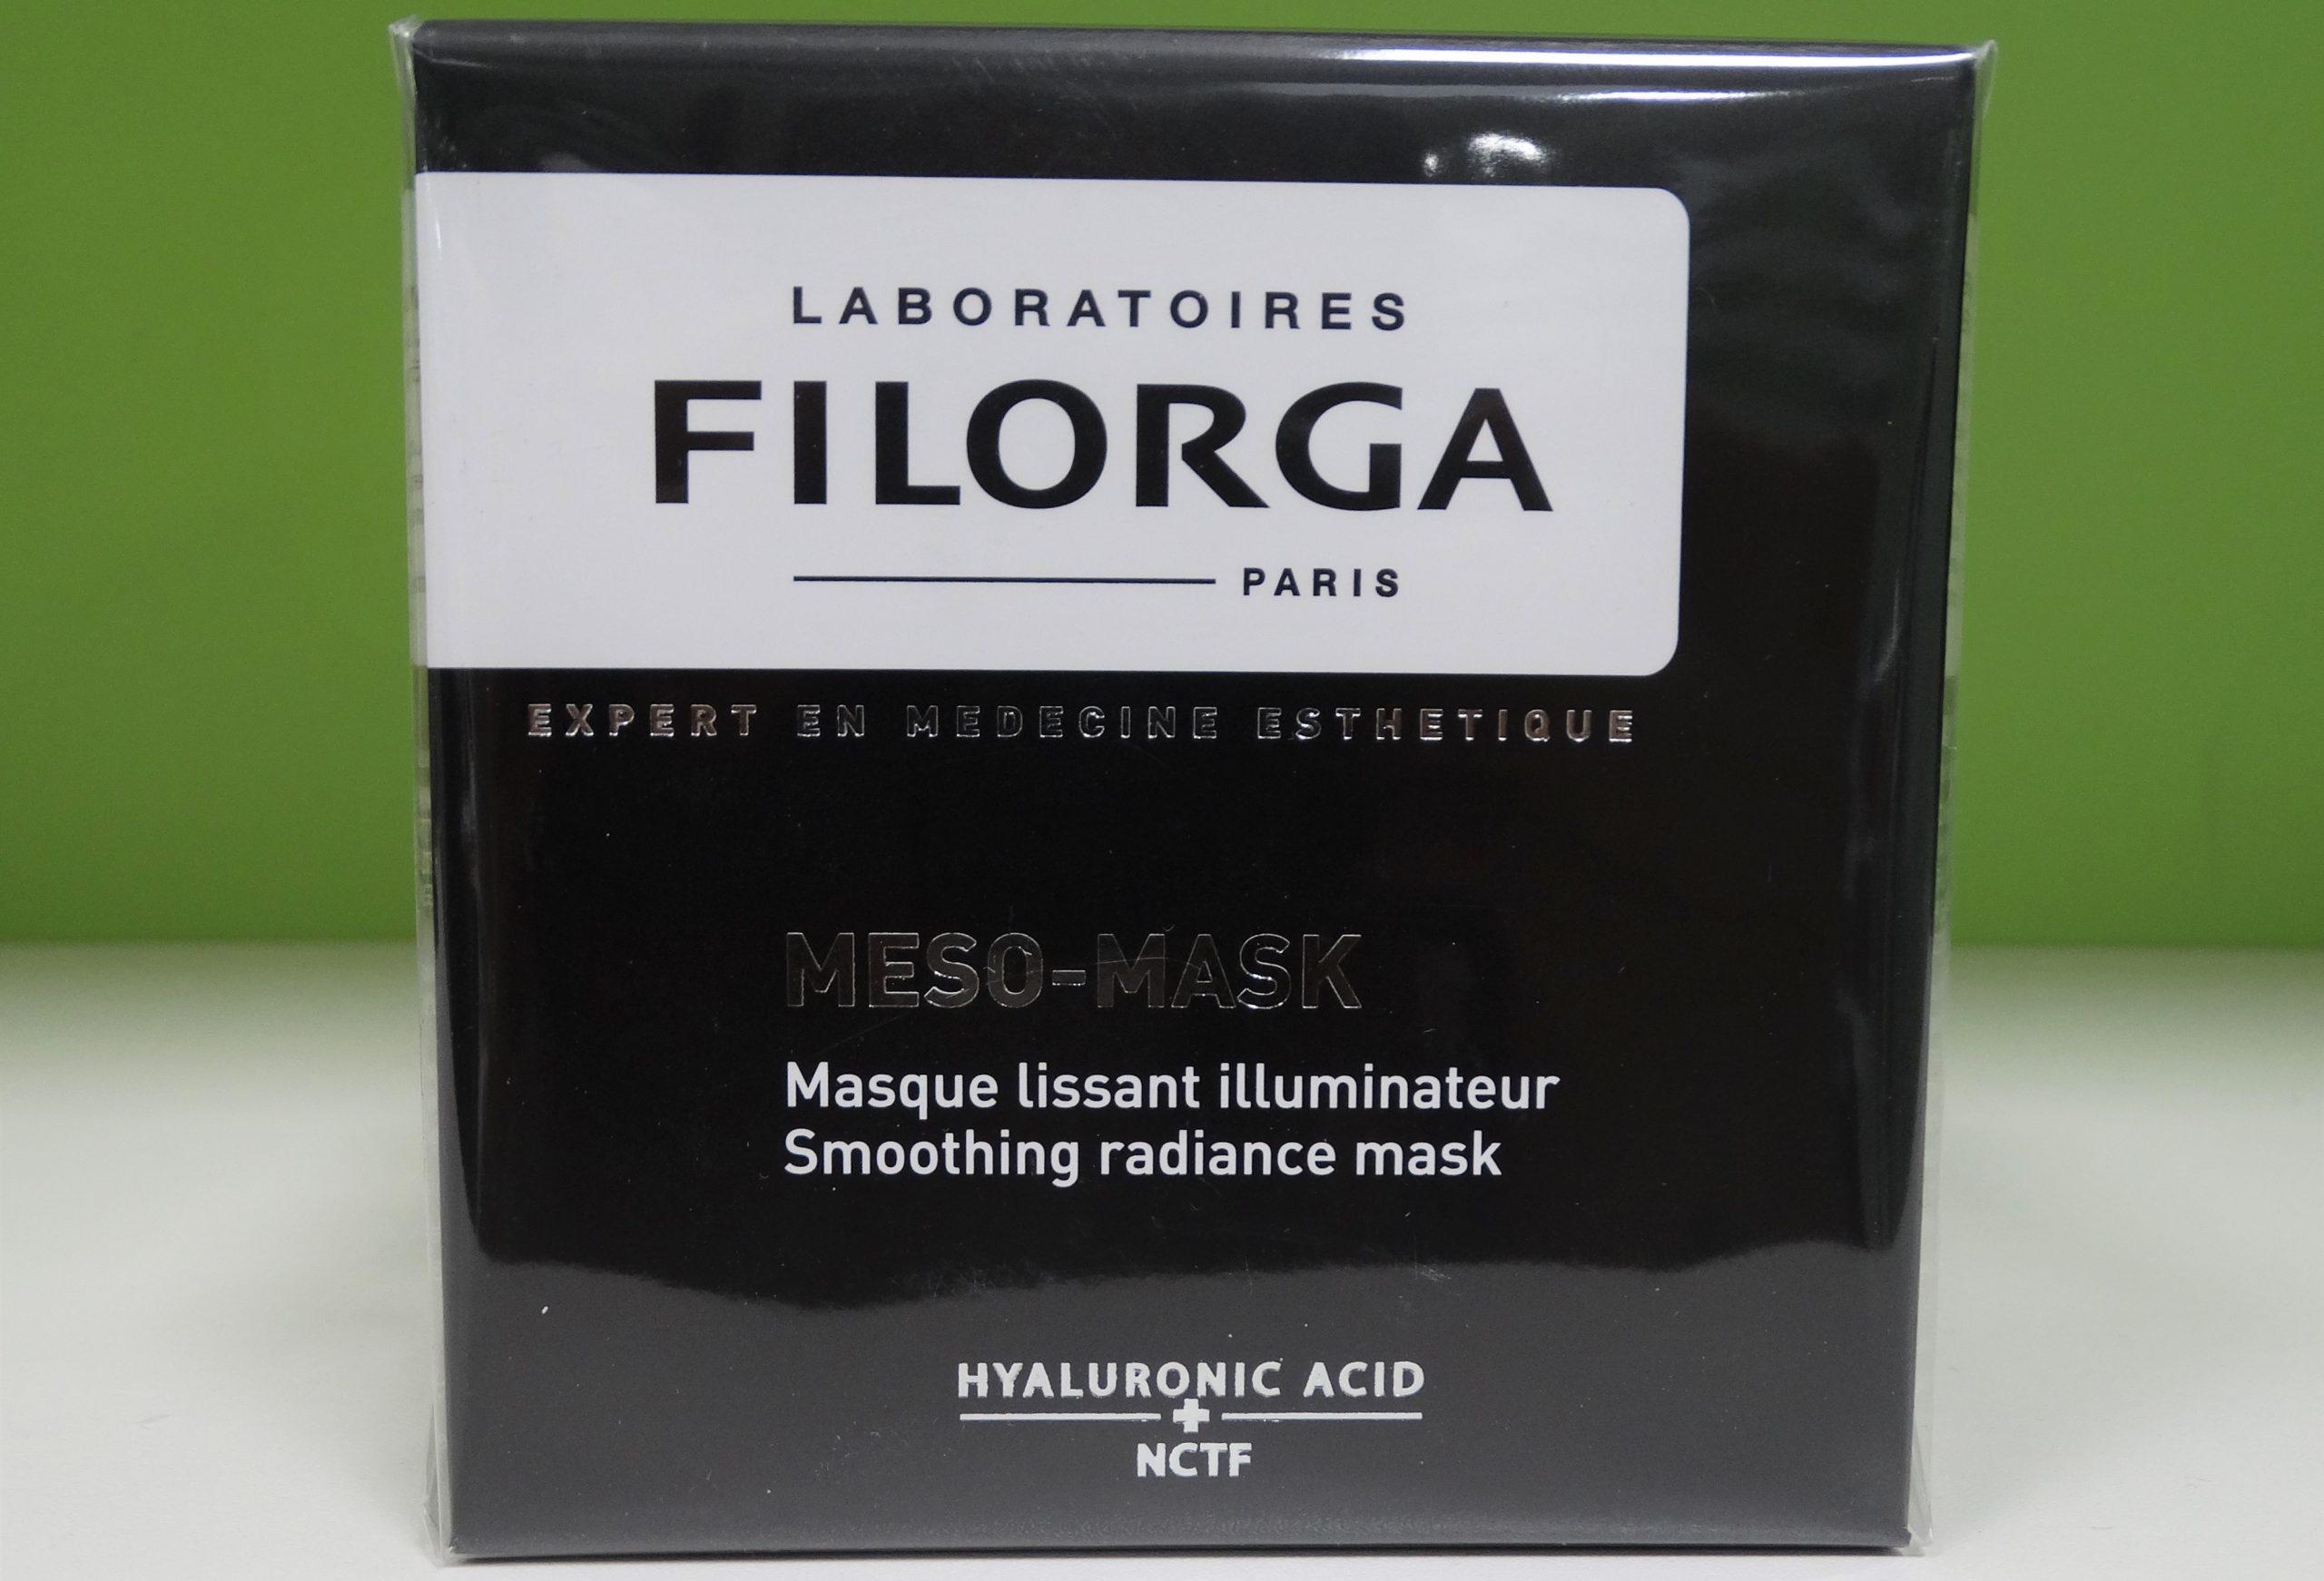 Comprar FILORGA MESO MASK 50ML Máscara alisadora e iluminadora, para tono apagado y tez congestionada.